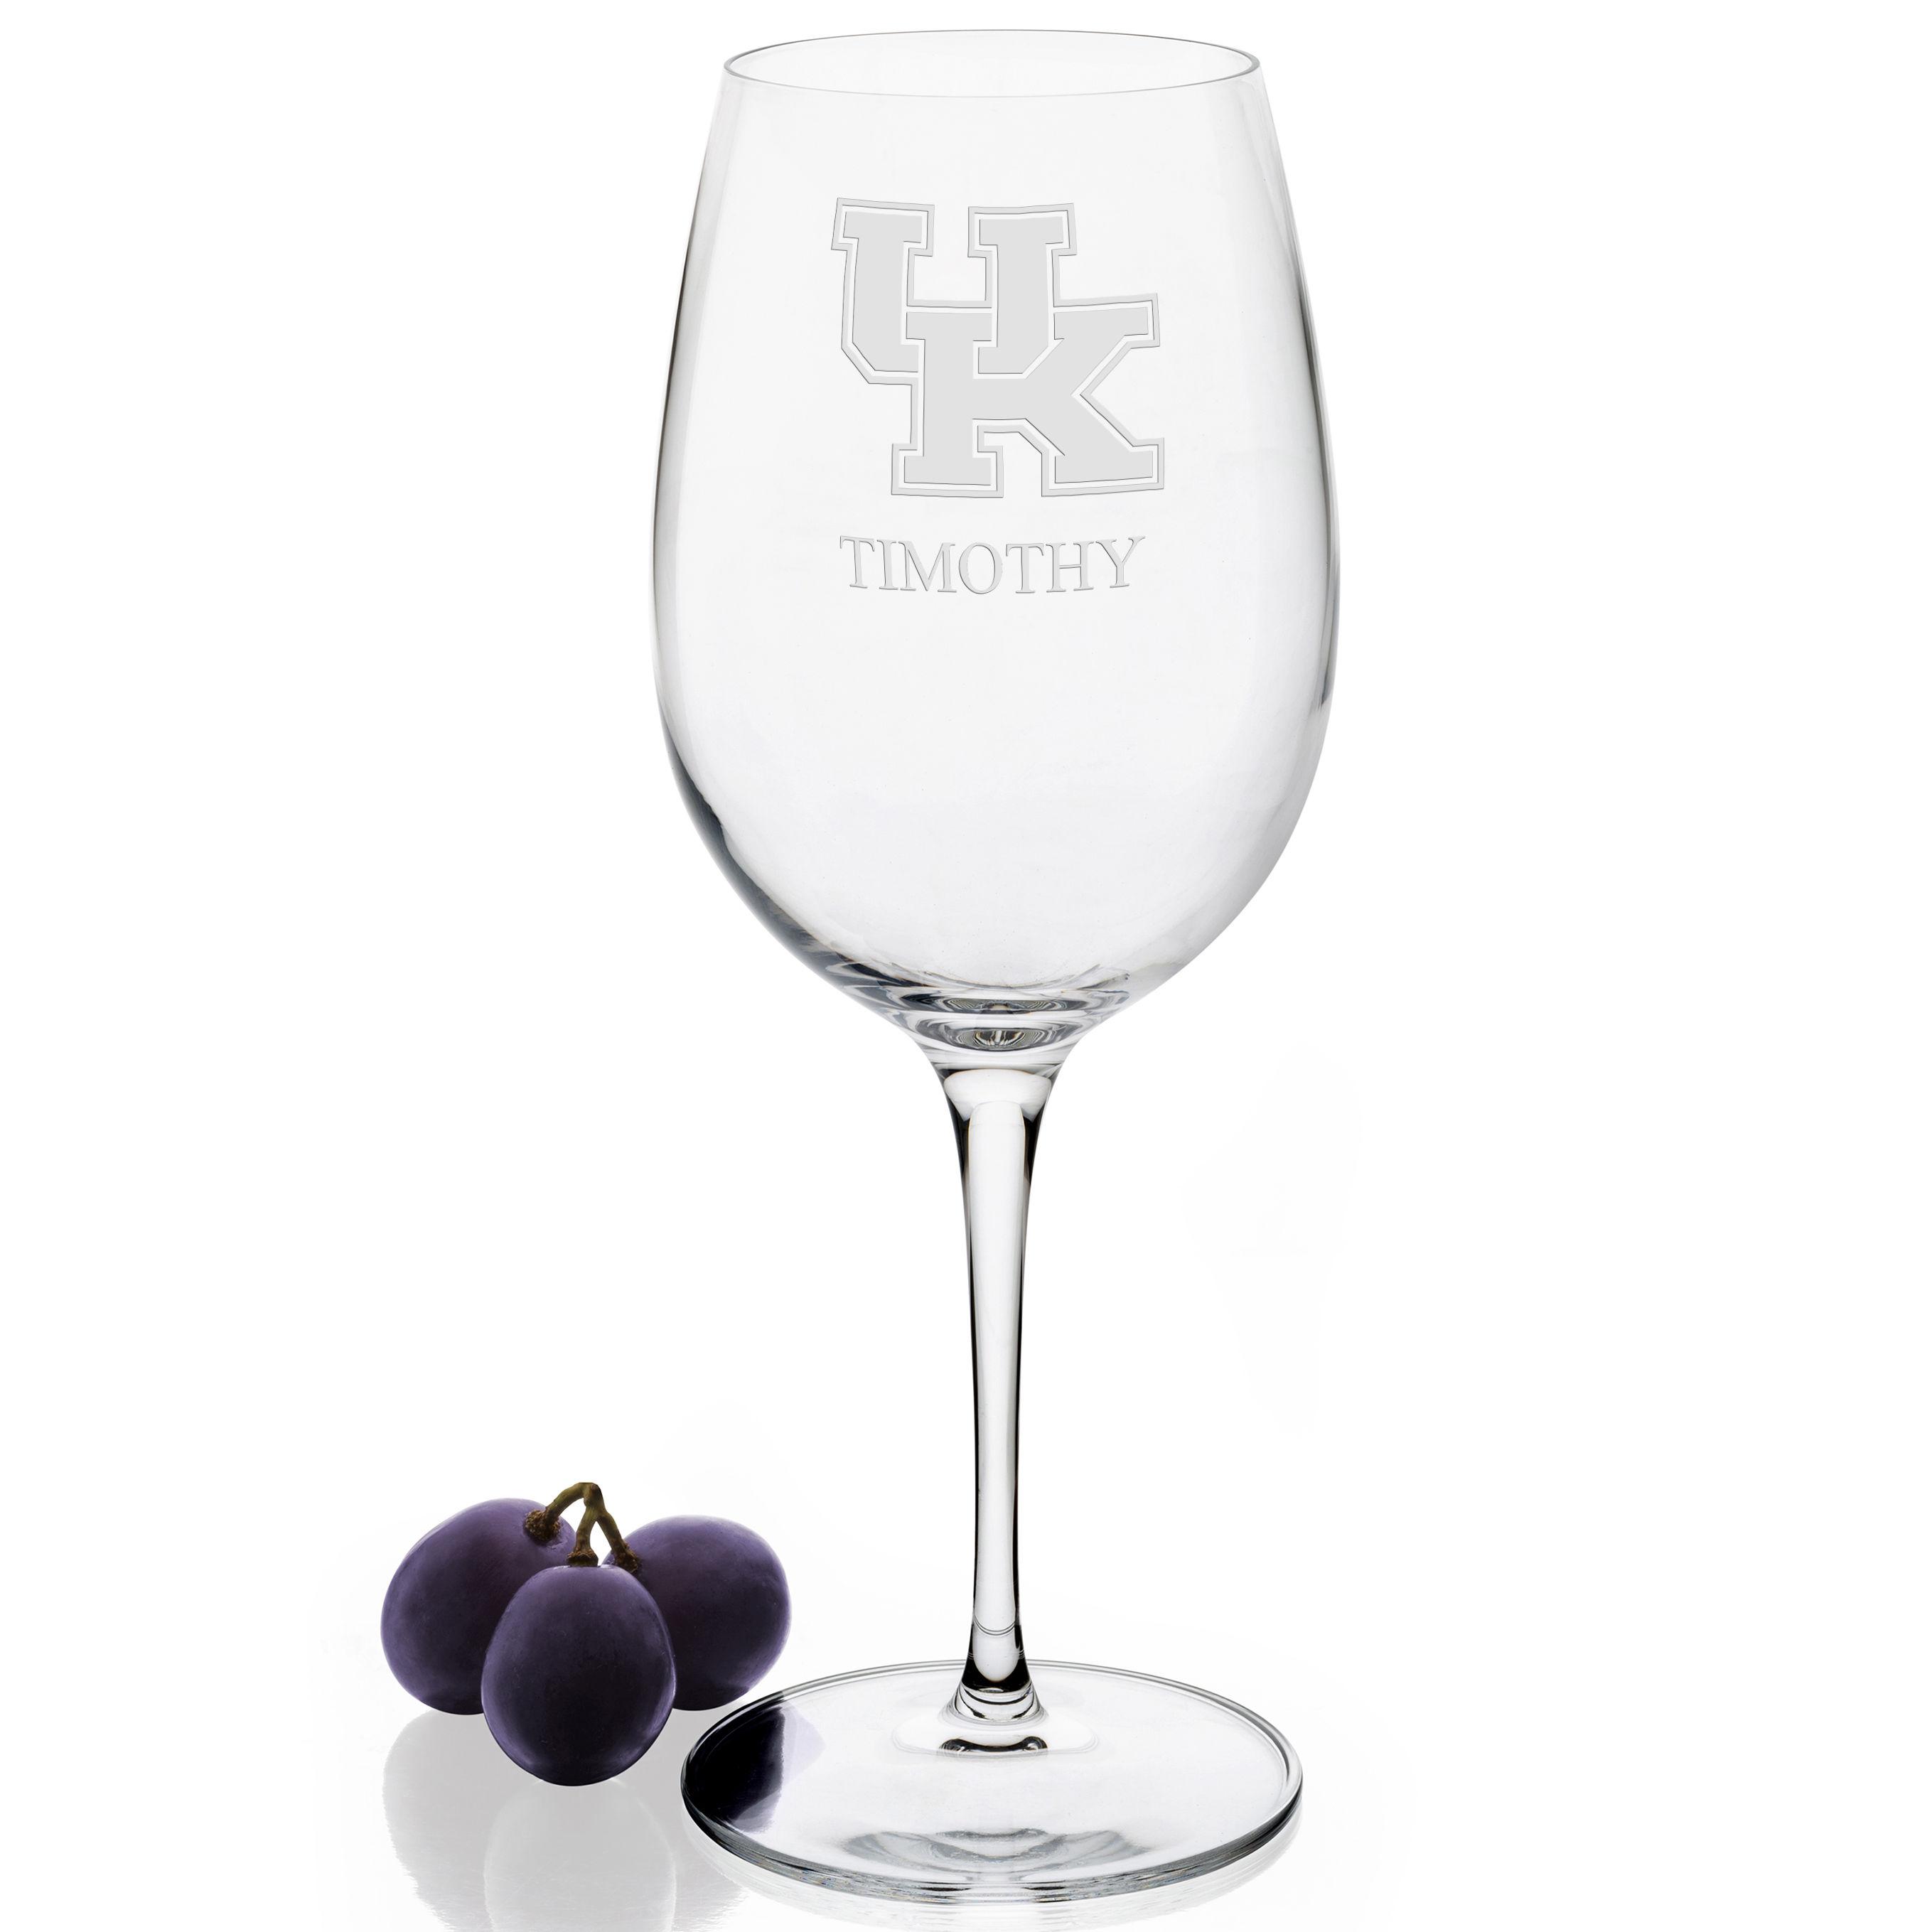 University of Kentucky Red Wine Glasses - Set of 2 - Image 2